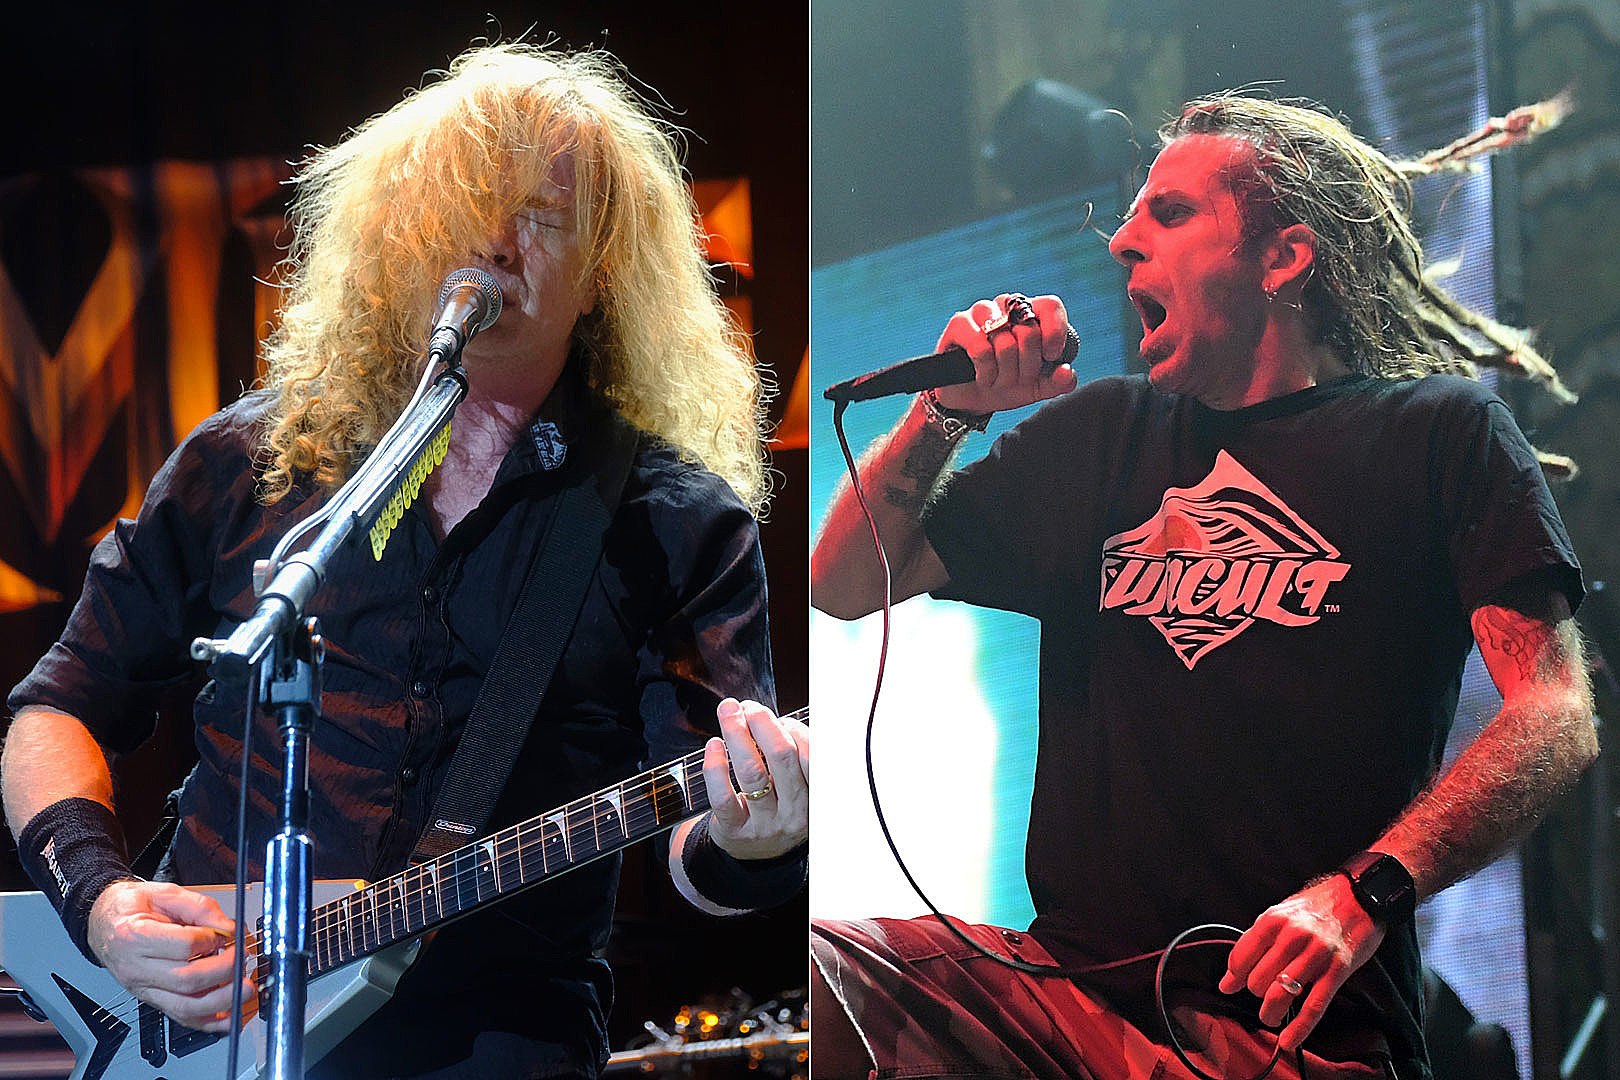 Megadeth + Lamb of God Tour Postponing Canadian Dates Until 2022